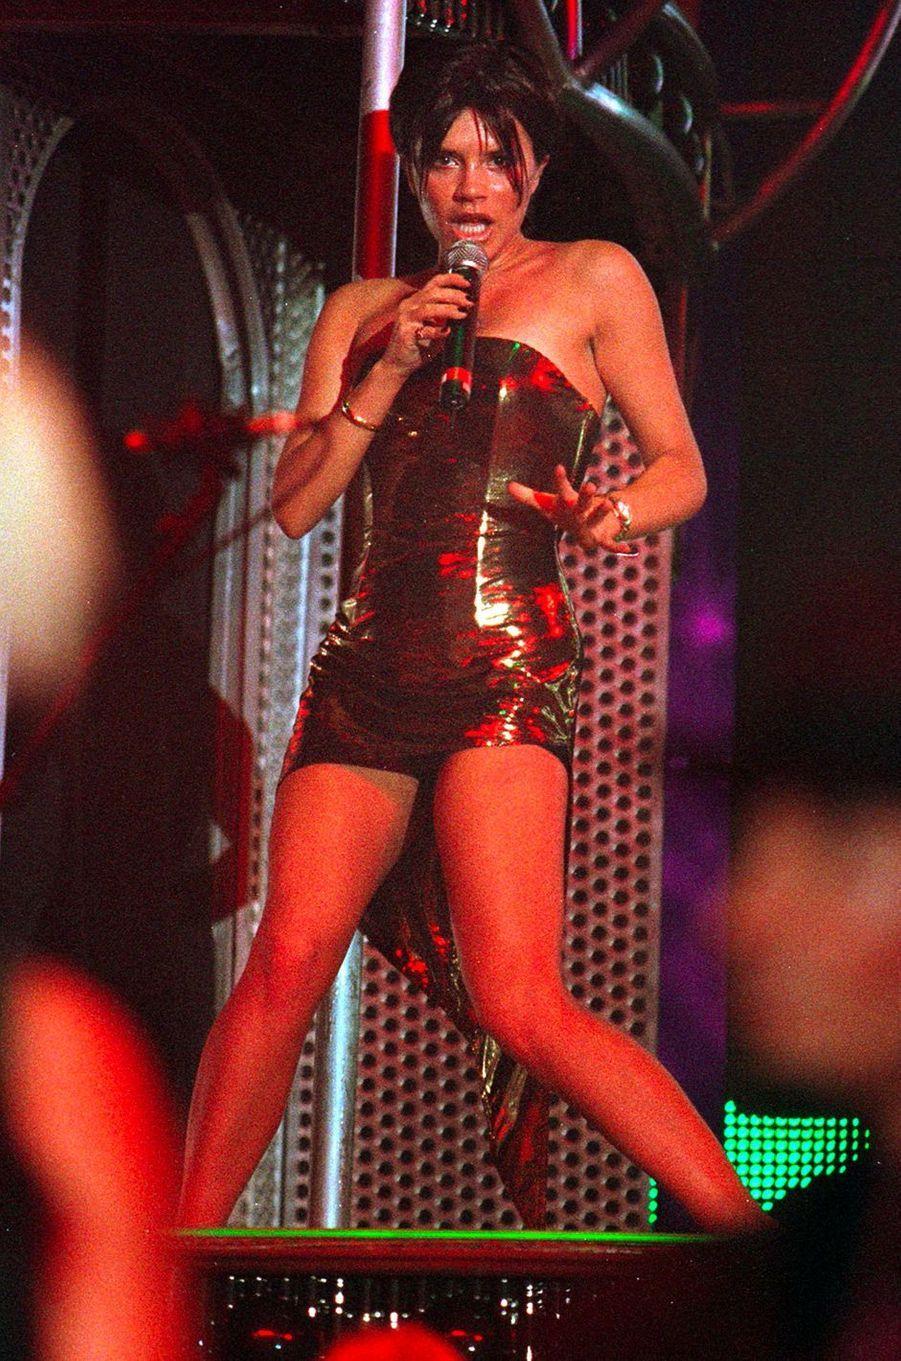 Victoria Beckham, aka Posh Spice, le 3 mars 1998